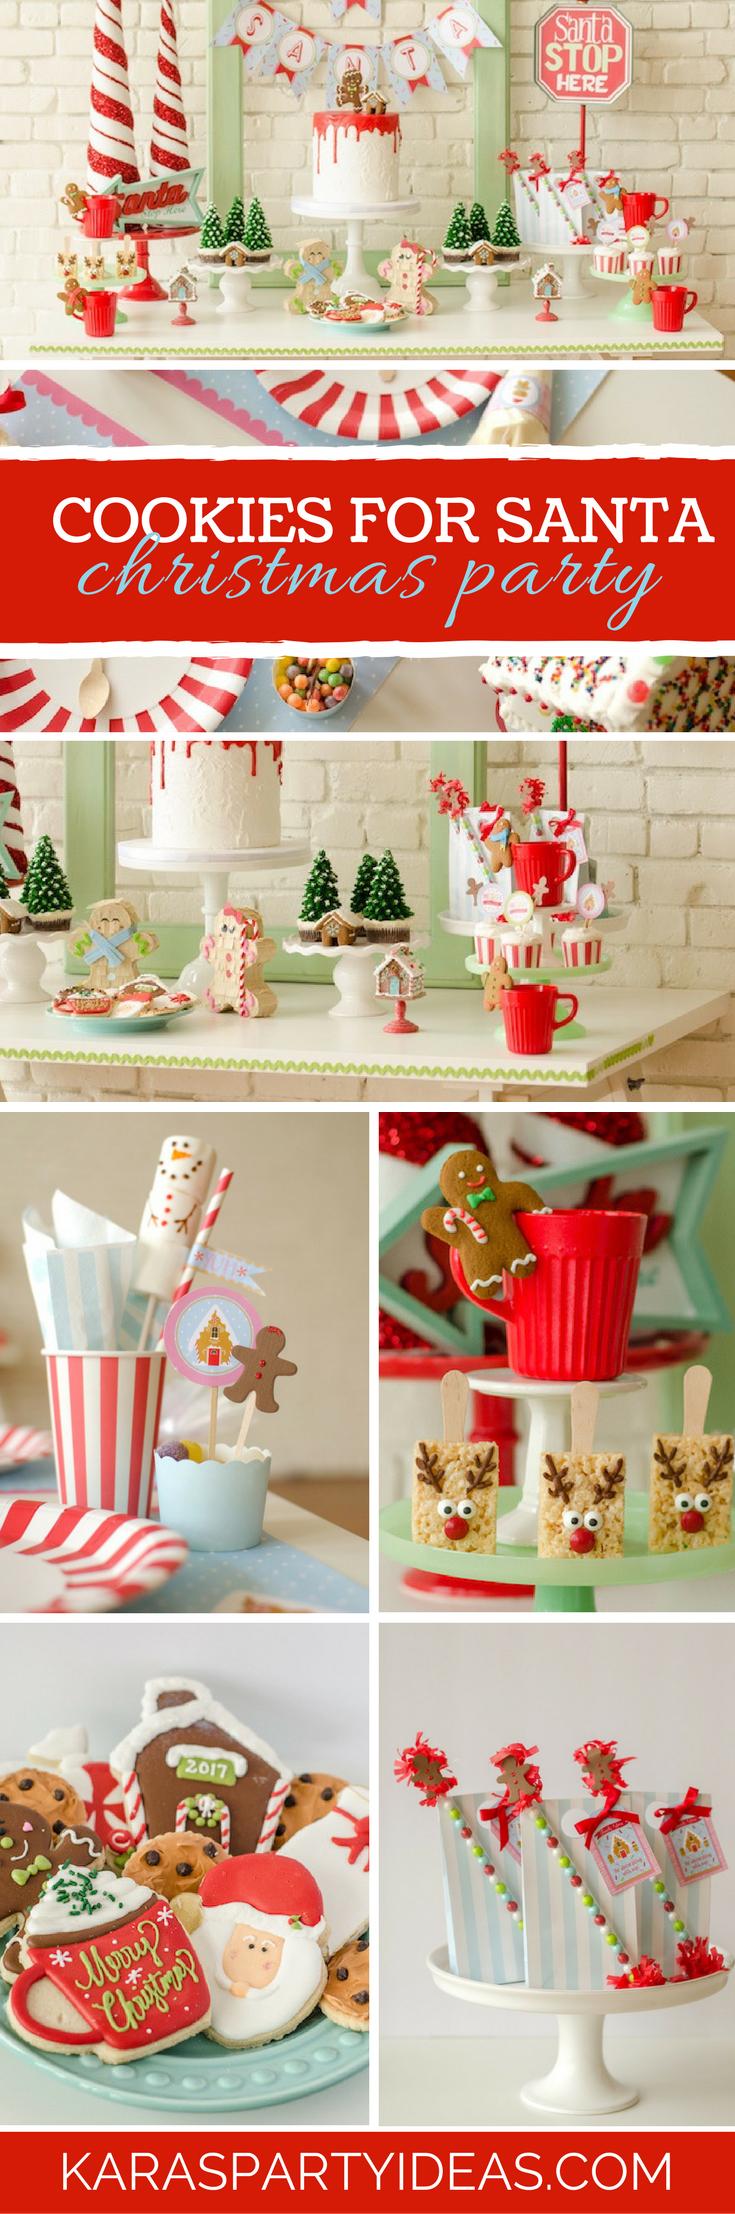 Cookies for Santa Christmas Party via Kara's Party Ideas - KarasPartyIdeas.com